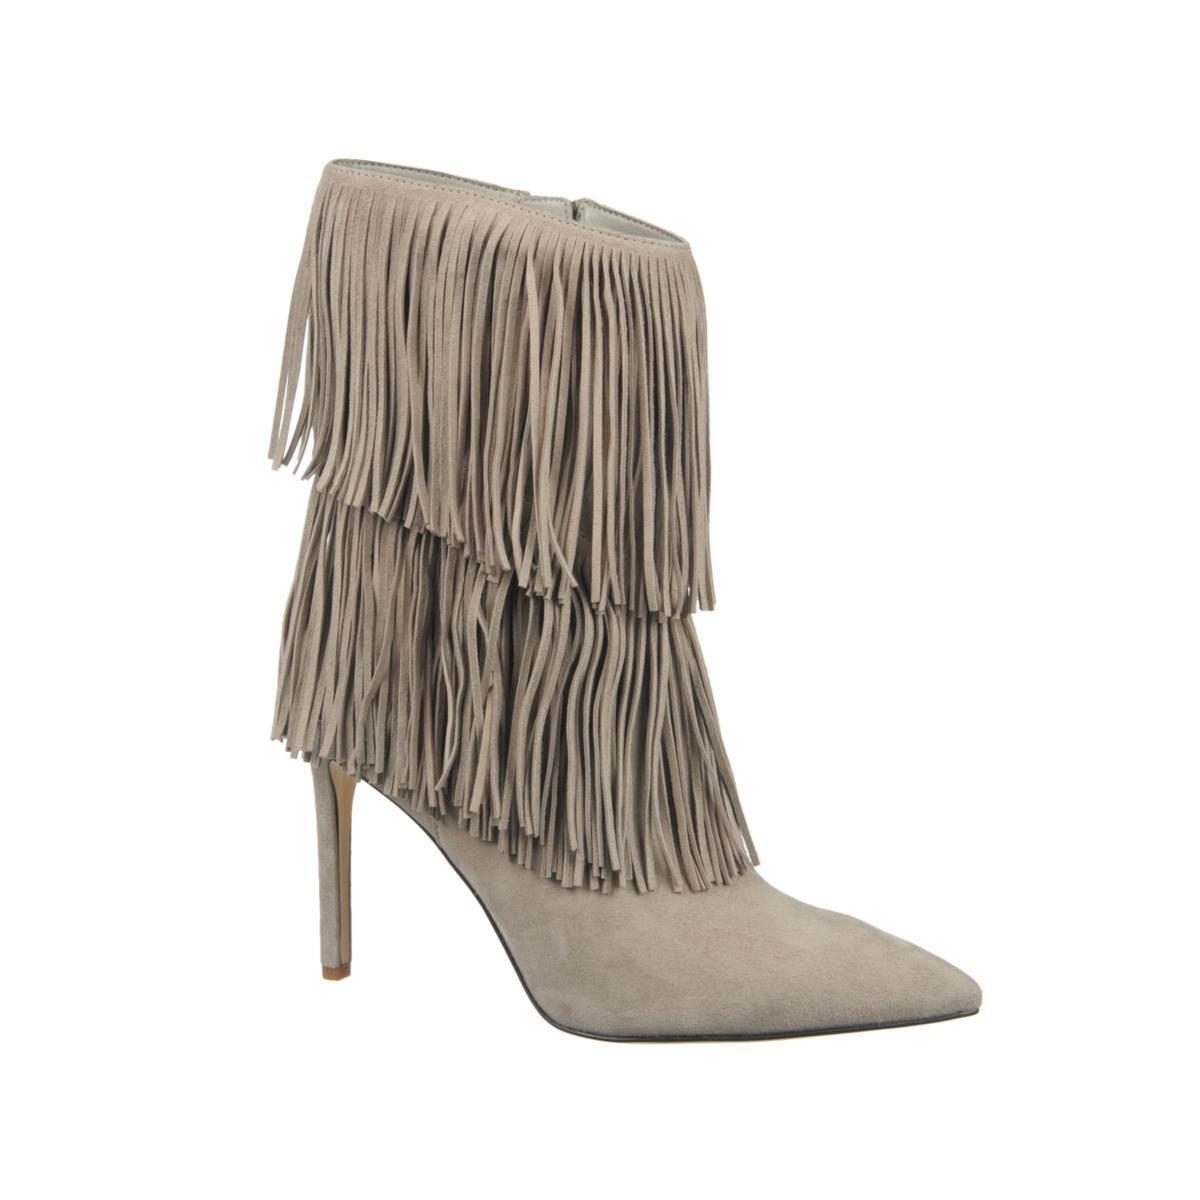 175.00 Sam Edelman  Belinda  Fringed Leather Boot 434379J CLEARANCE